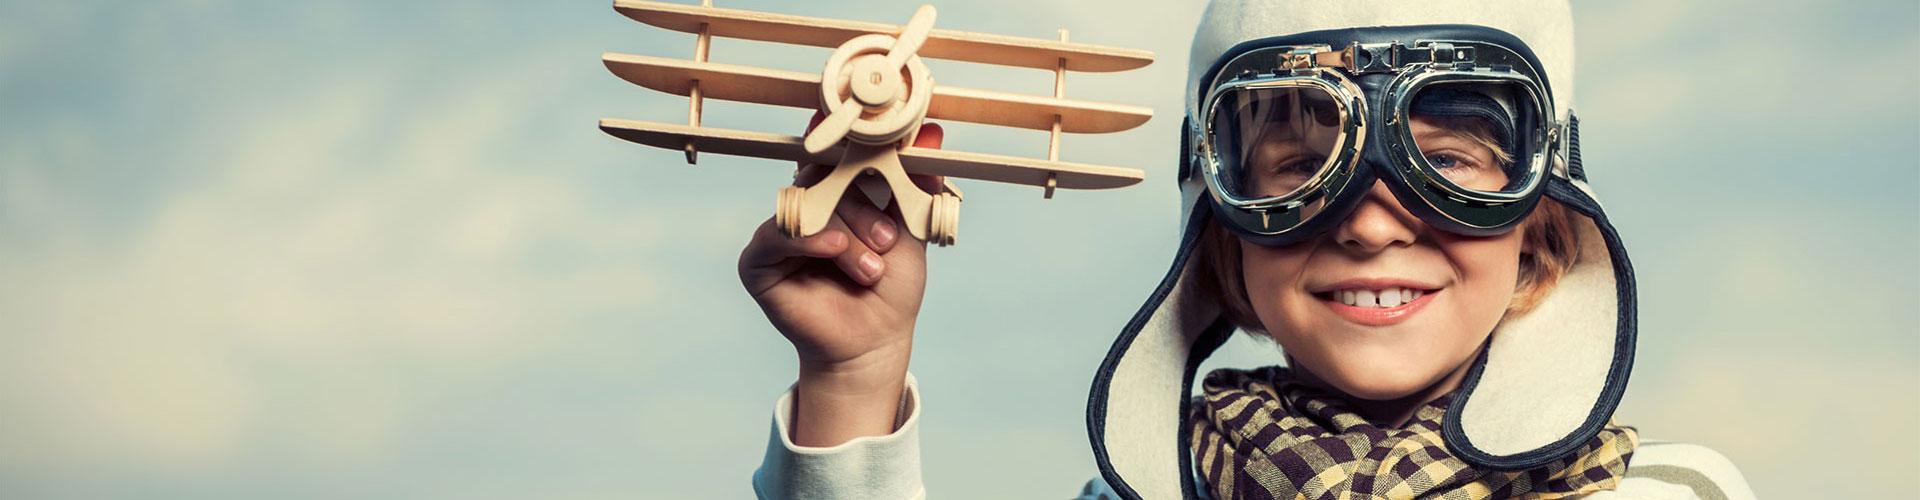 Fluggenuss | Flugangst bekämpfen - Gruppenseminare gegen Flugangst